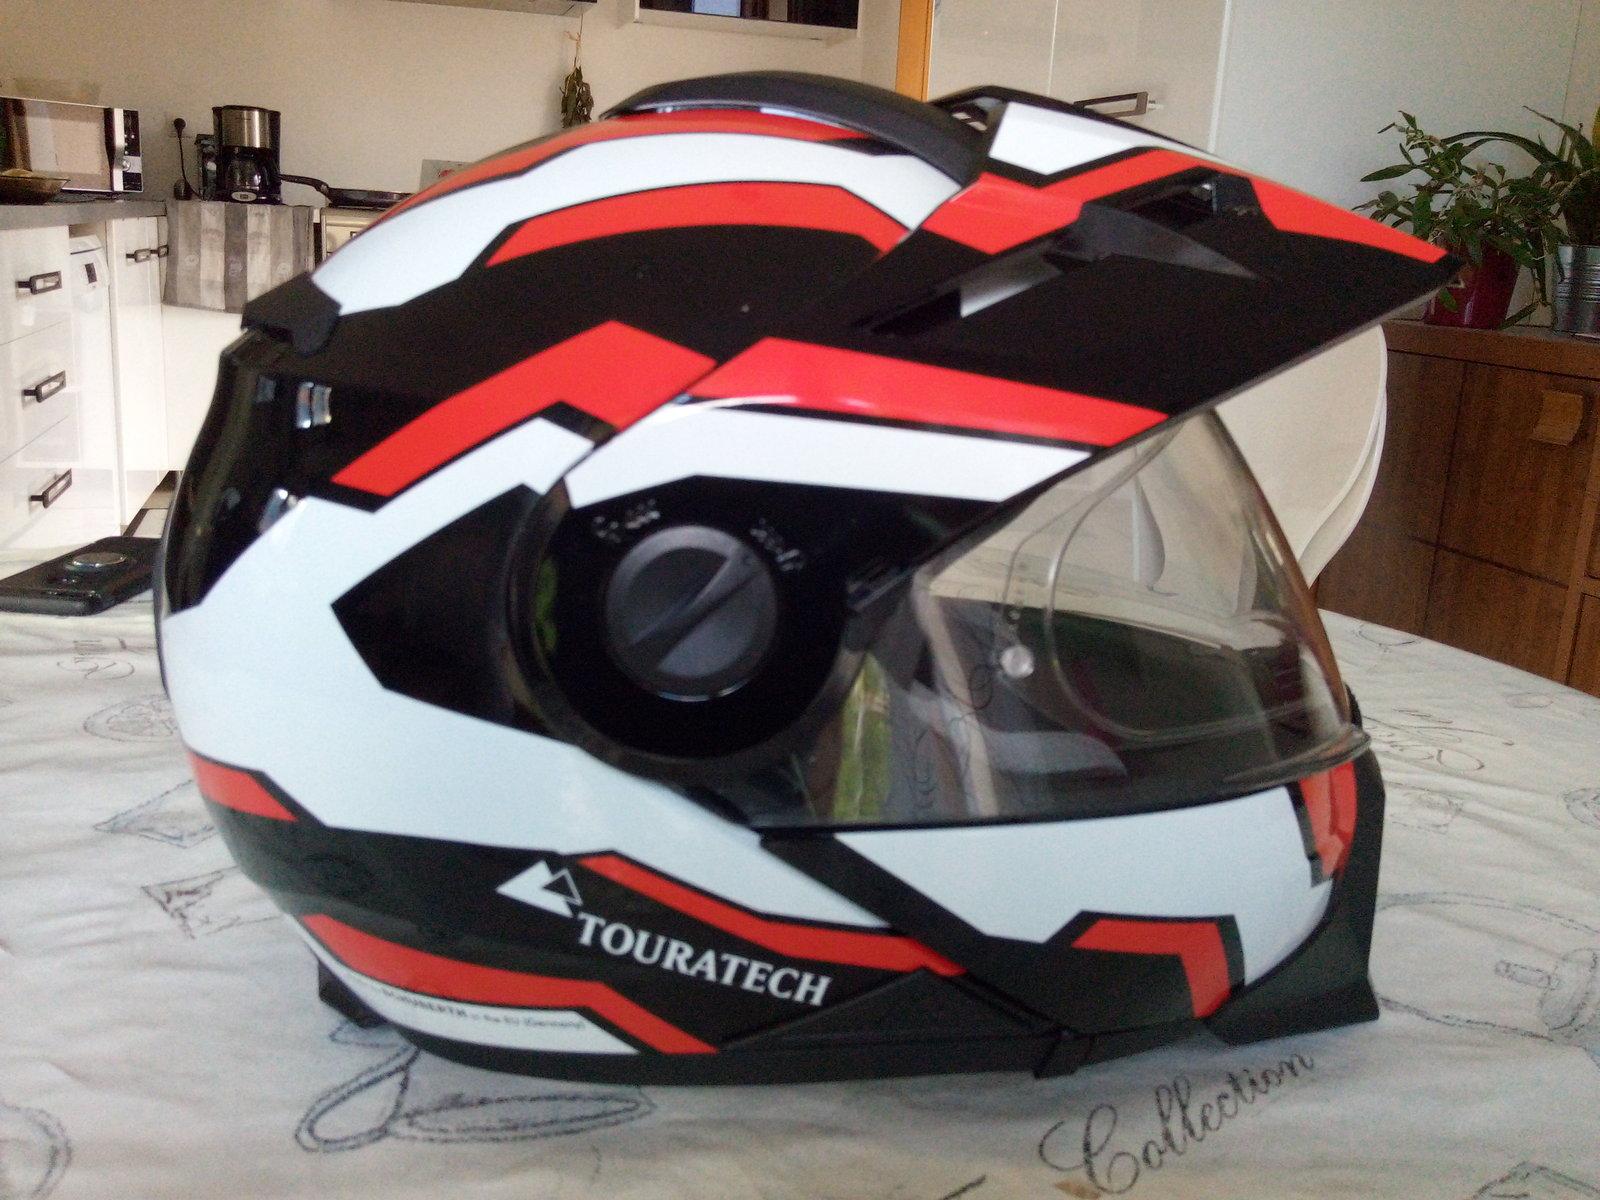 vend casque touratech 200929025014401656